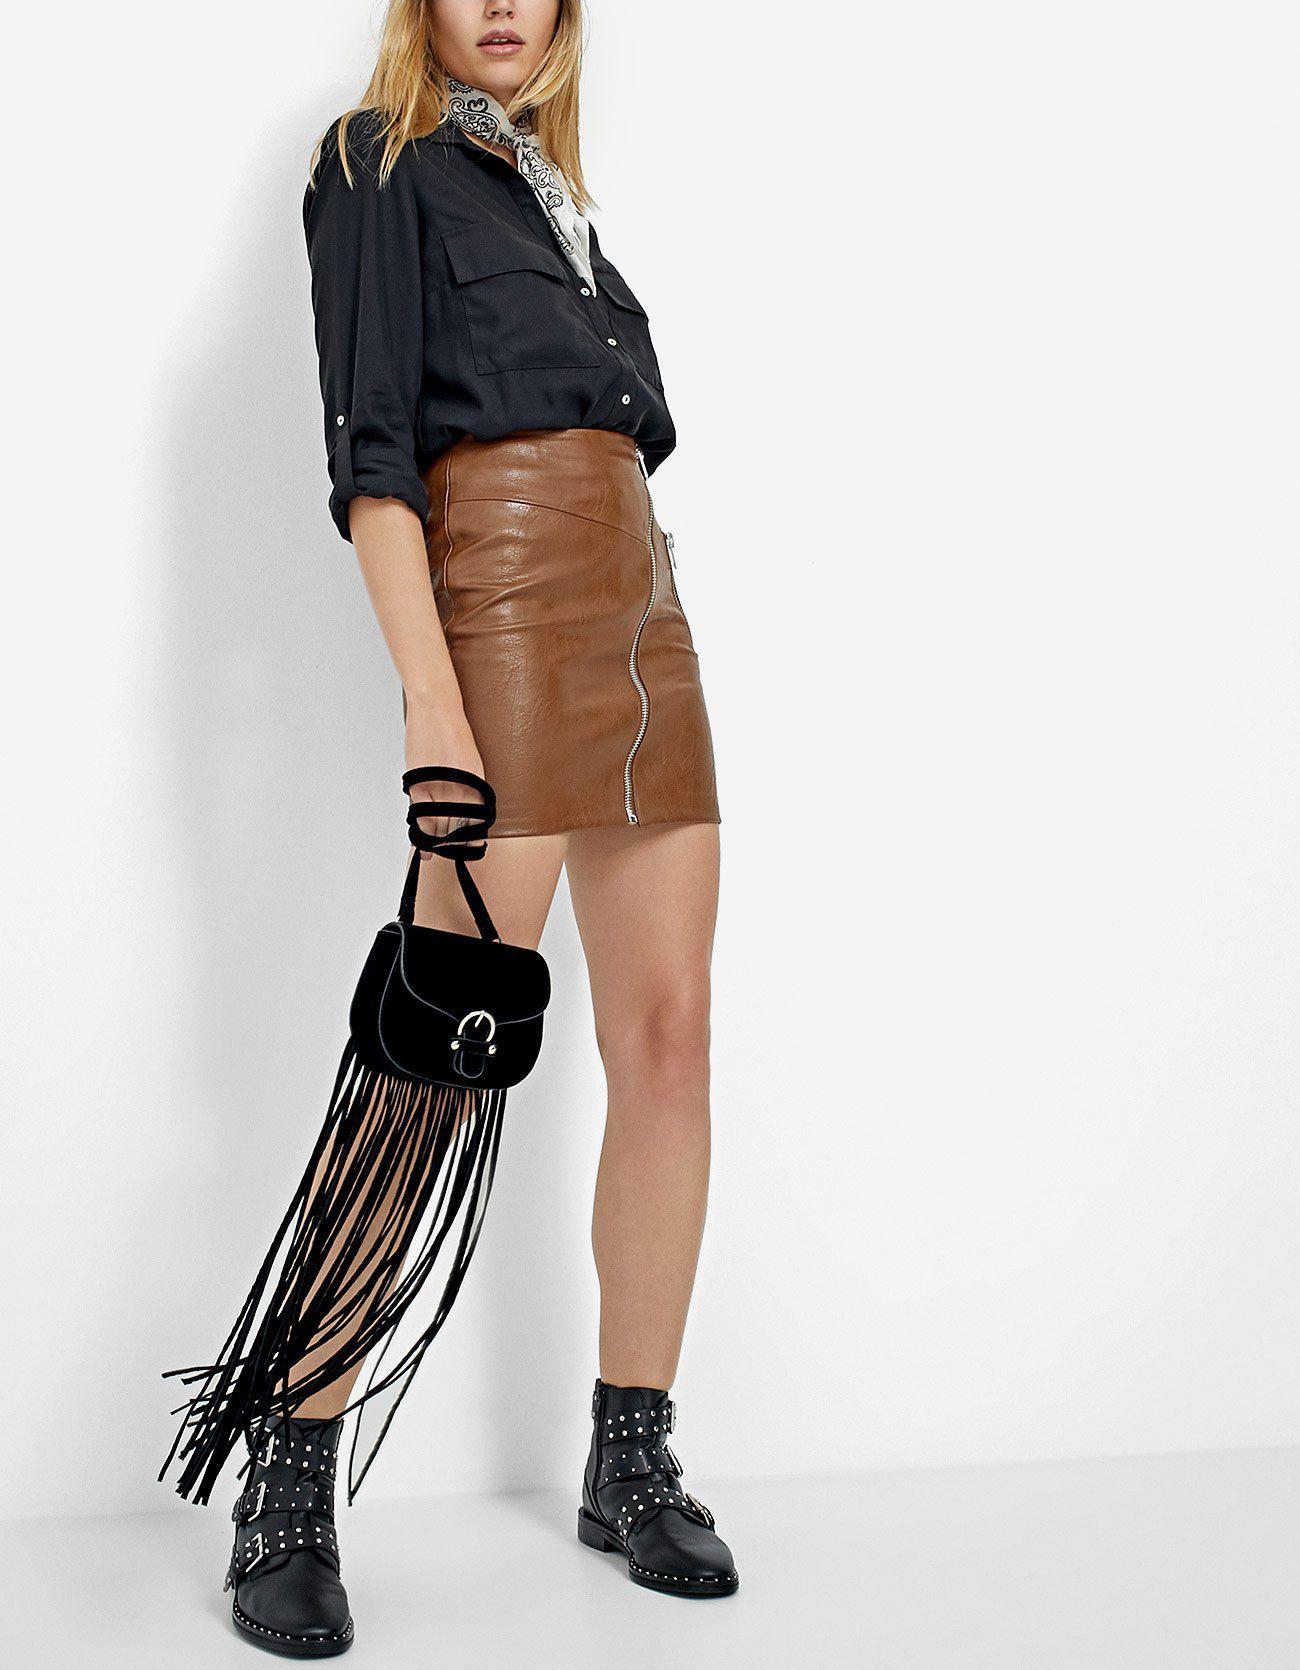 Zaboravite na (pre)skup Givenchyjev model - pronašli smo još bolju high street verziju!